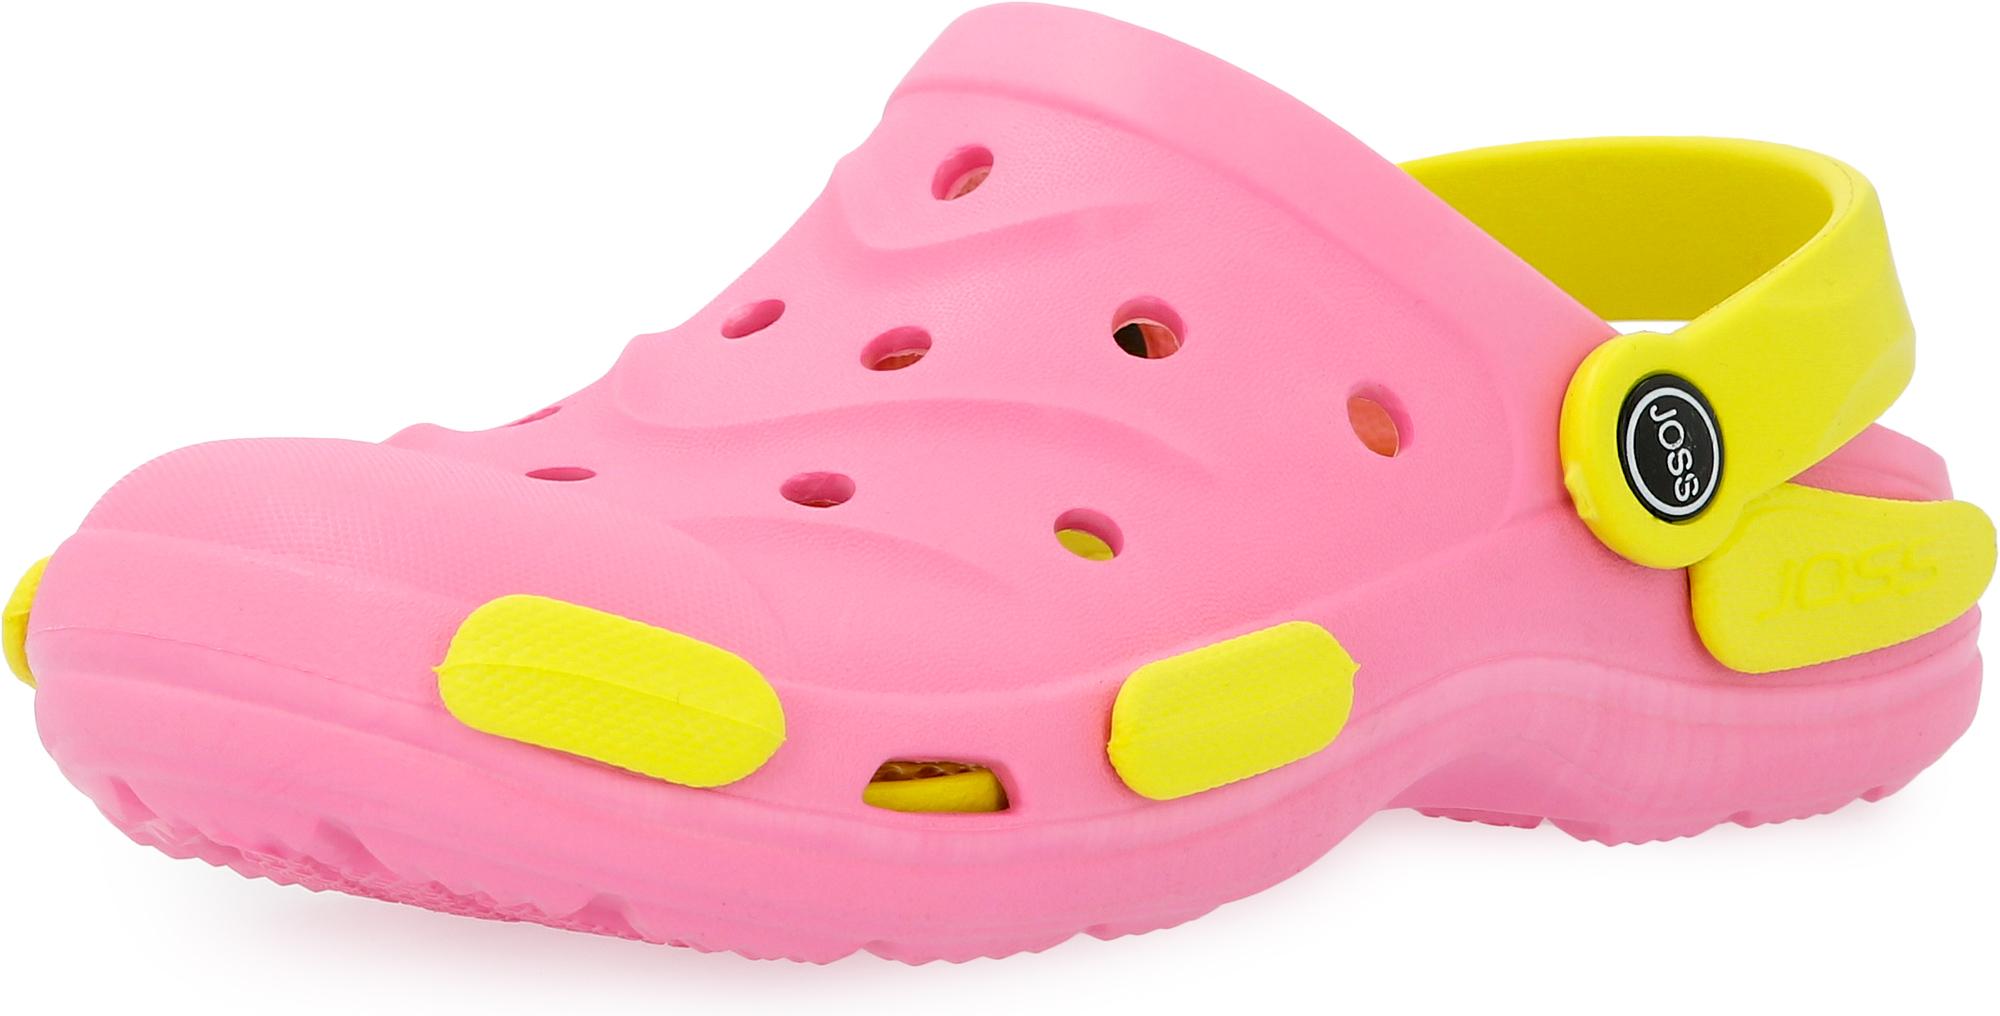 цена Joss Шлепанцы для девочек Joss Garden Shoes, размер 28-29 онлайн в 2017 году